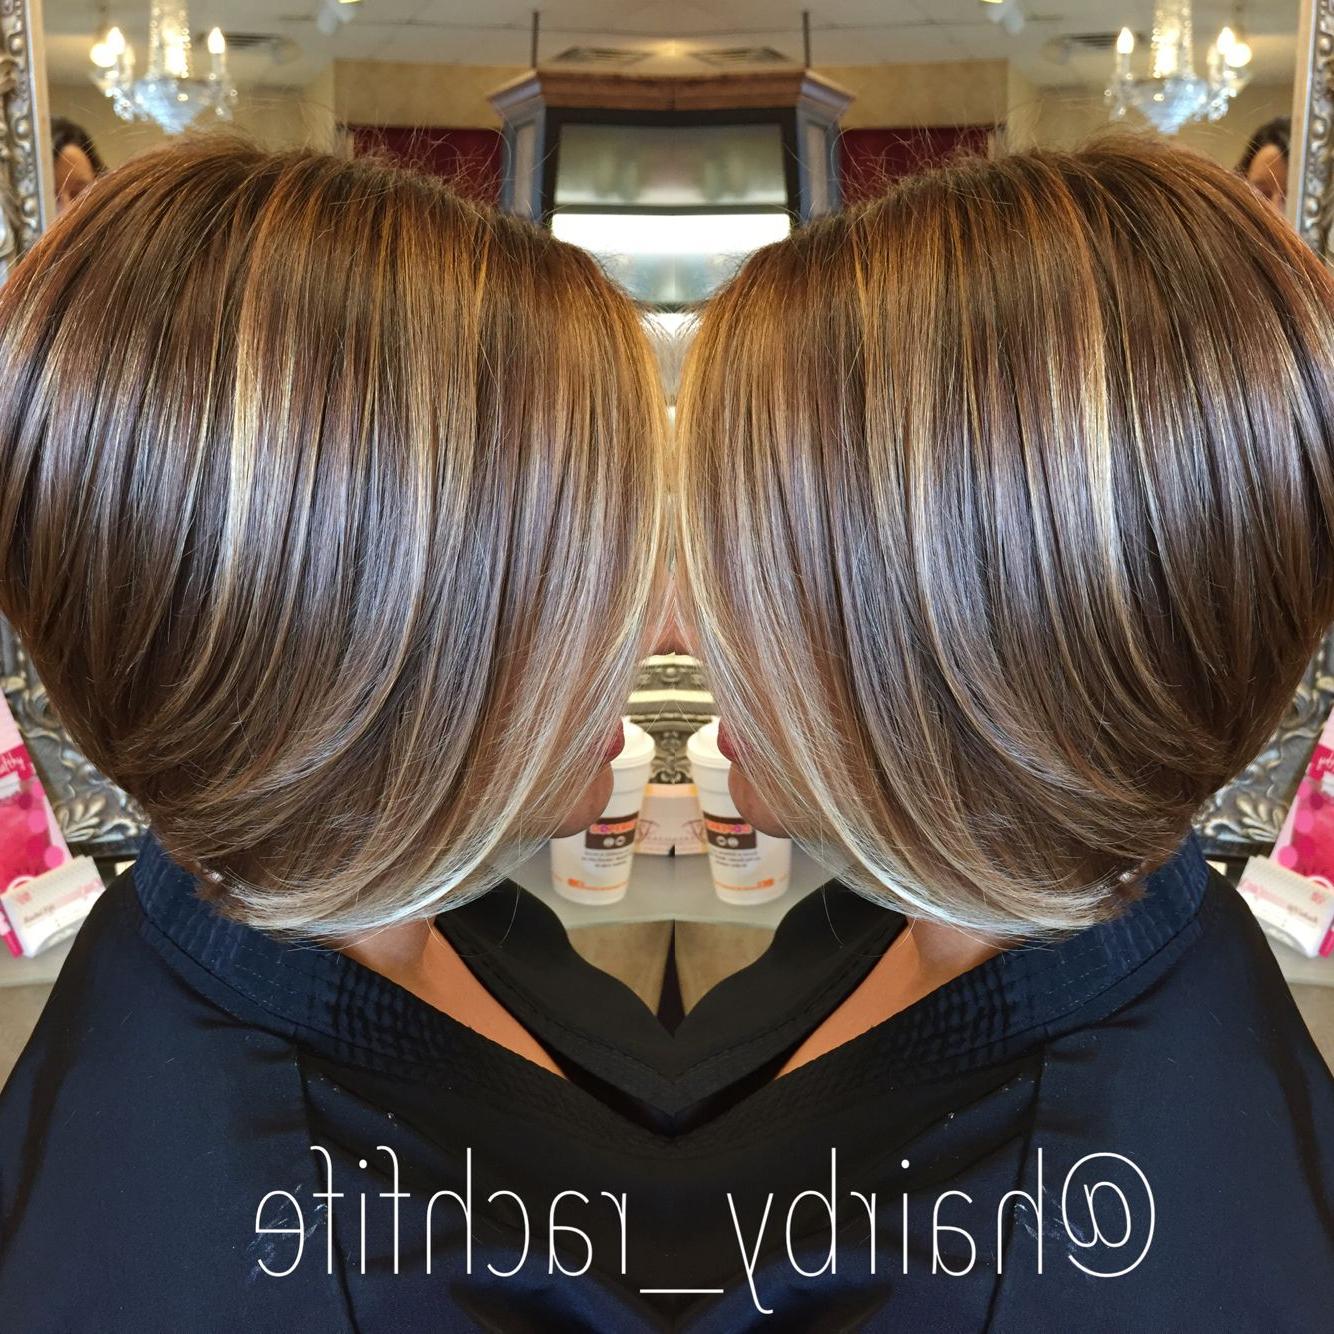 Short Bob Haircut With Subtle Balayage Highlights (View 17 of 20)